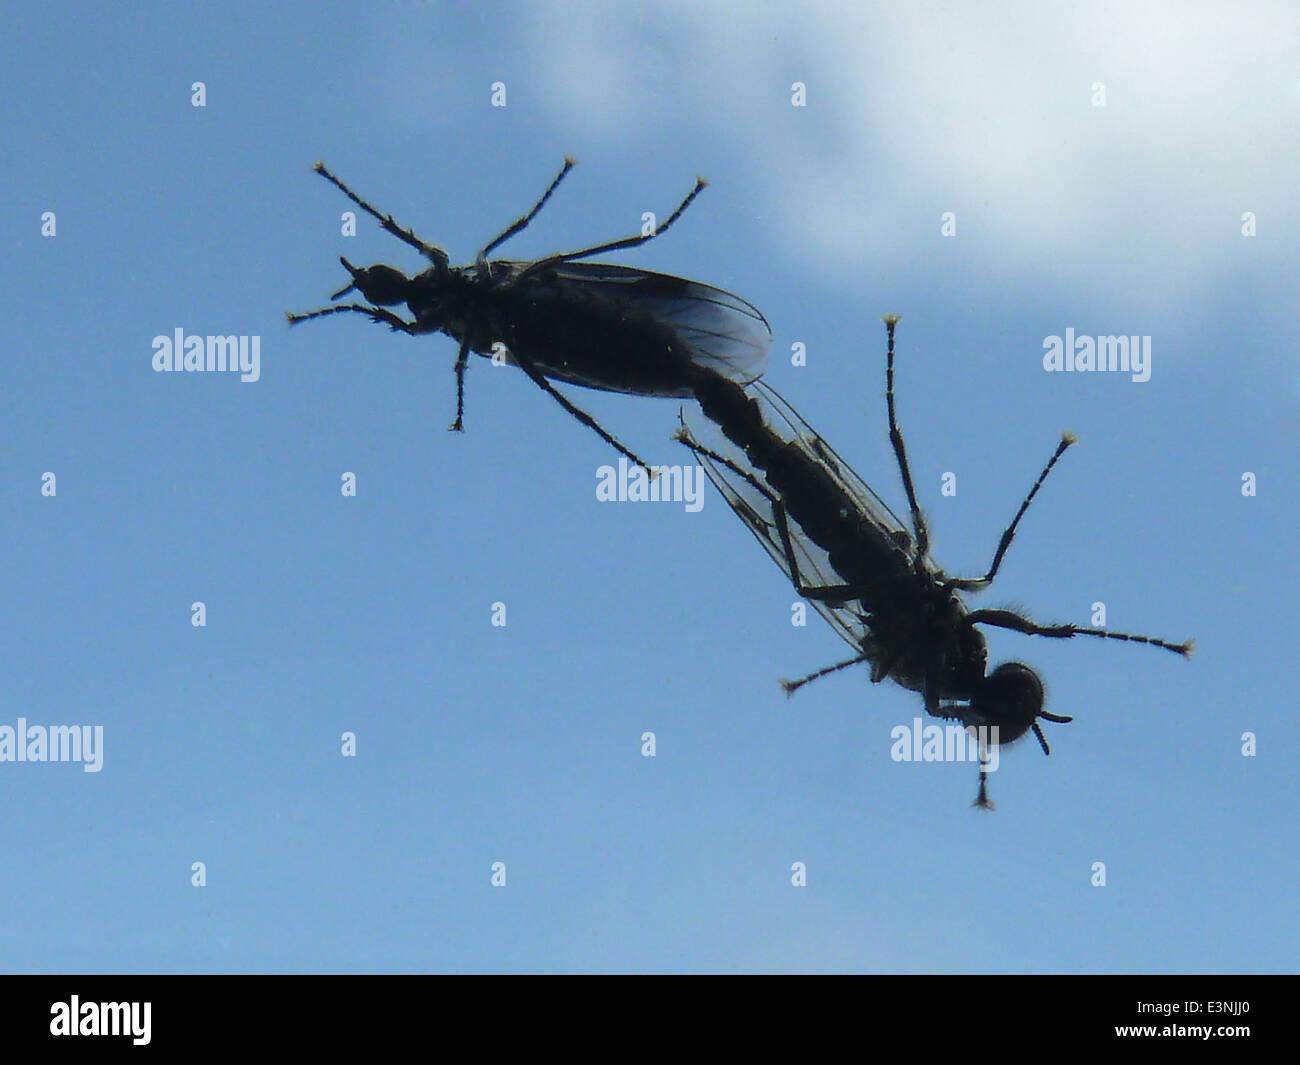 Insektenpaarung - Stock Image